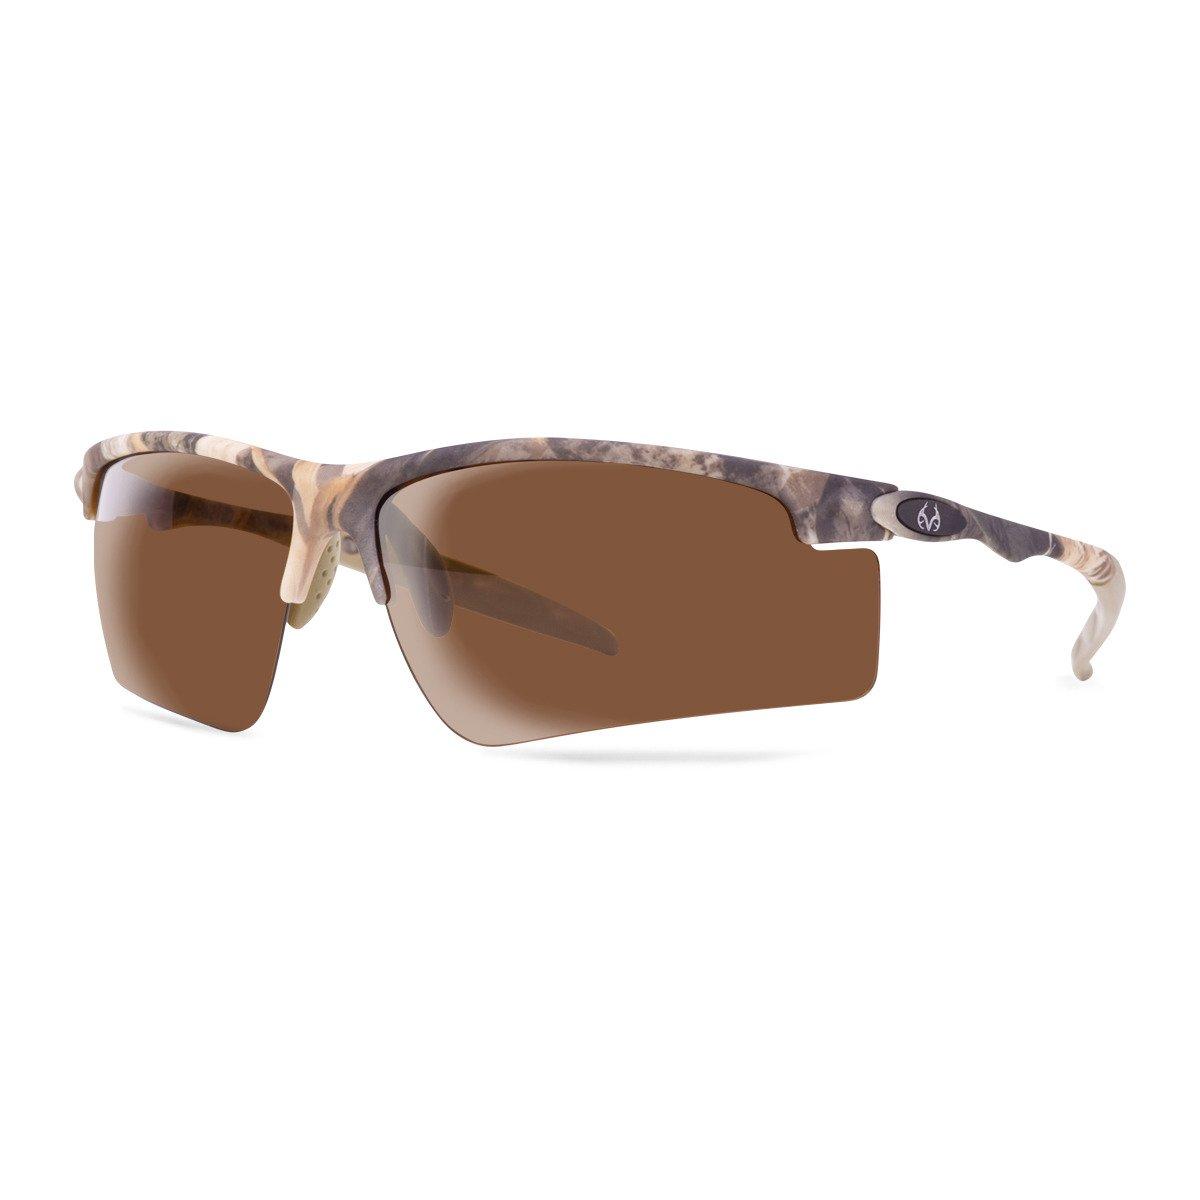 Realtree Adults' Drop Tine Polarized Sunglasses